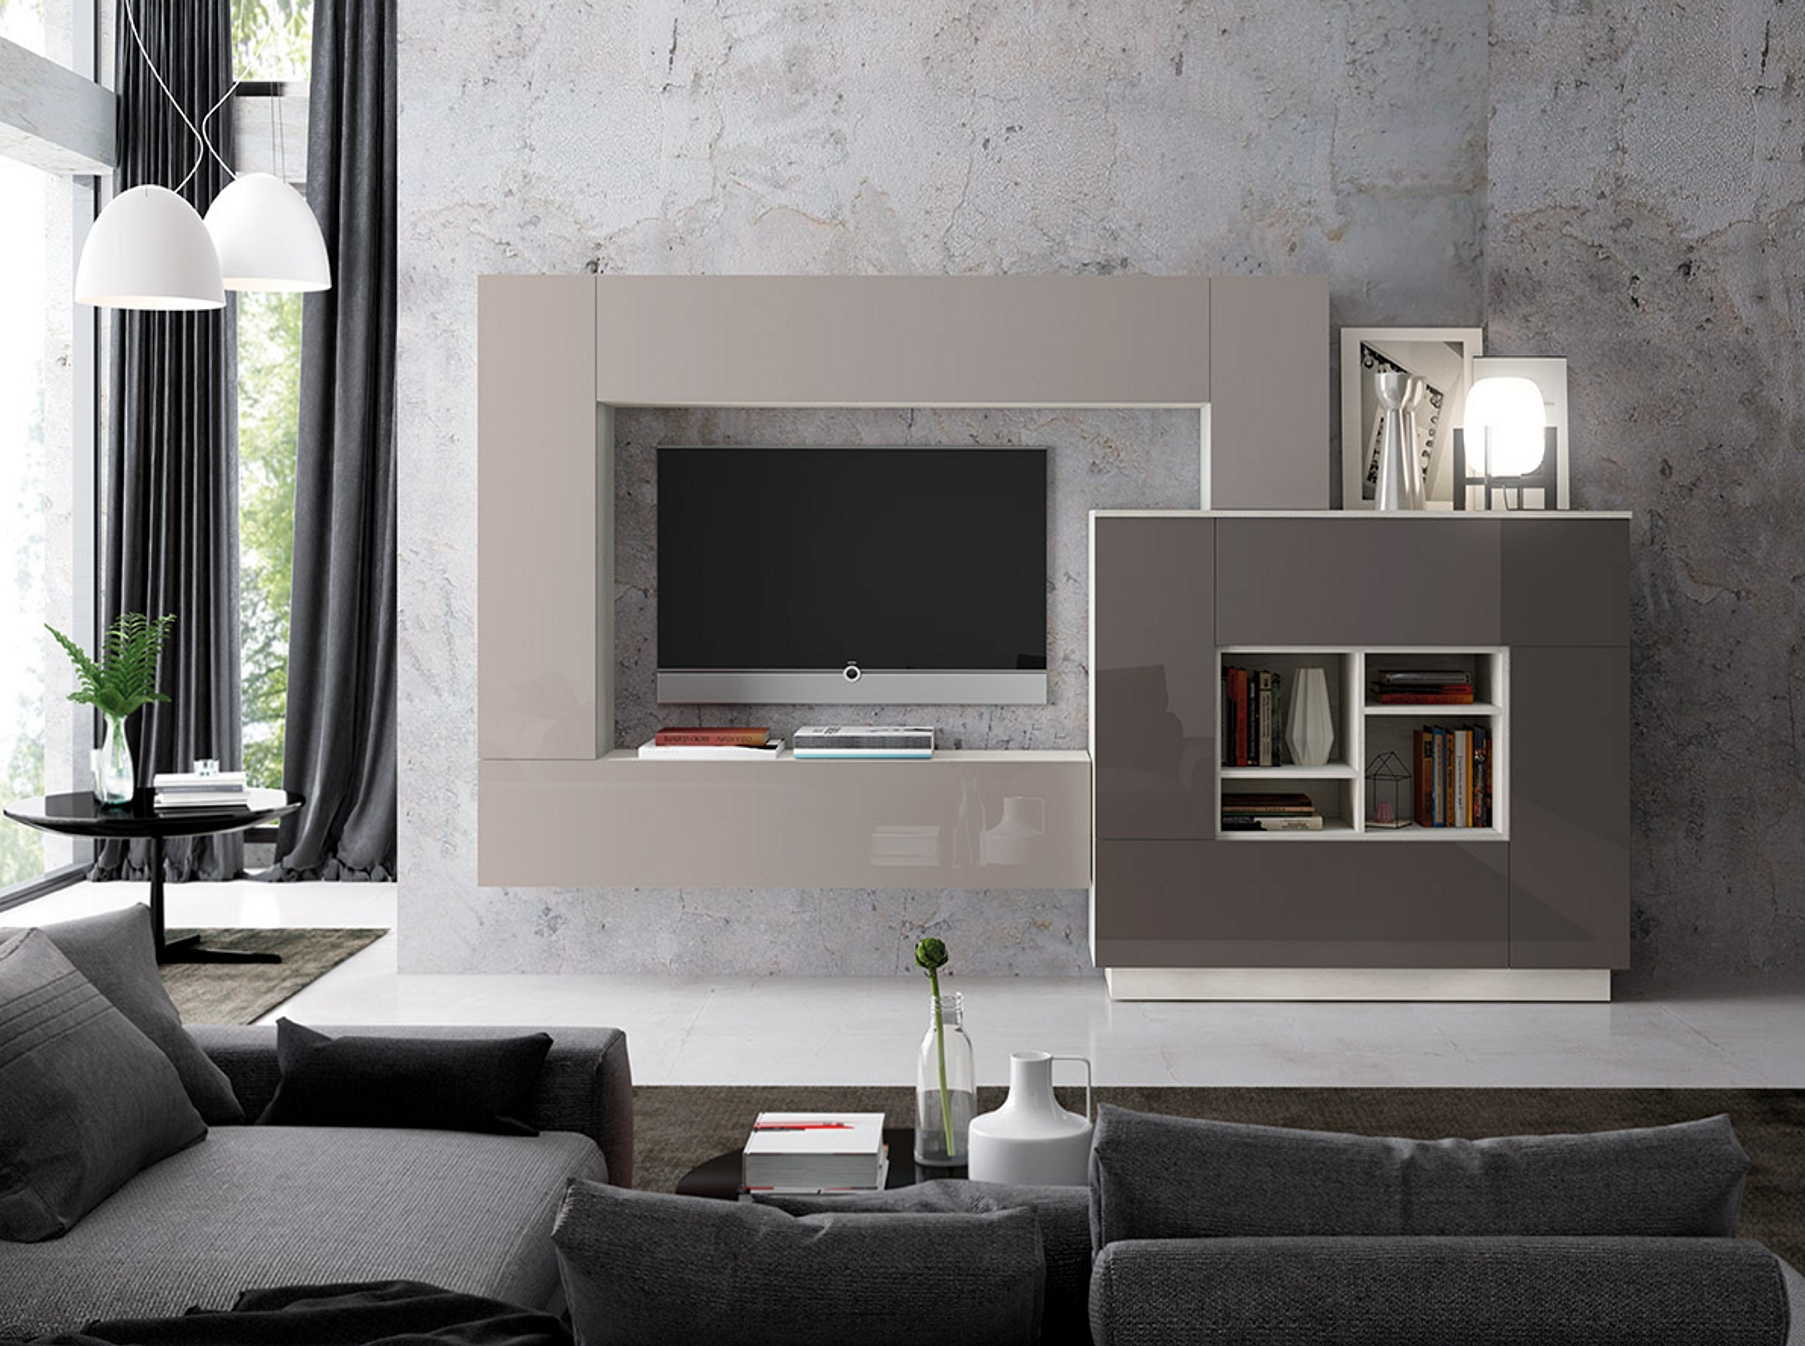 salon-moderno-Zion-3.0-muebles-paco-caballero-0907-5c8d32eb229c9